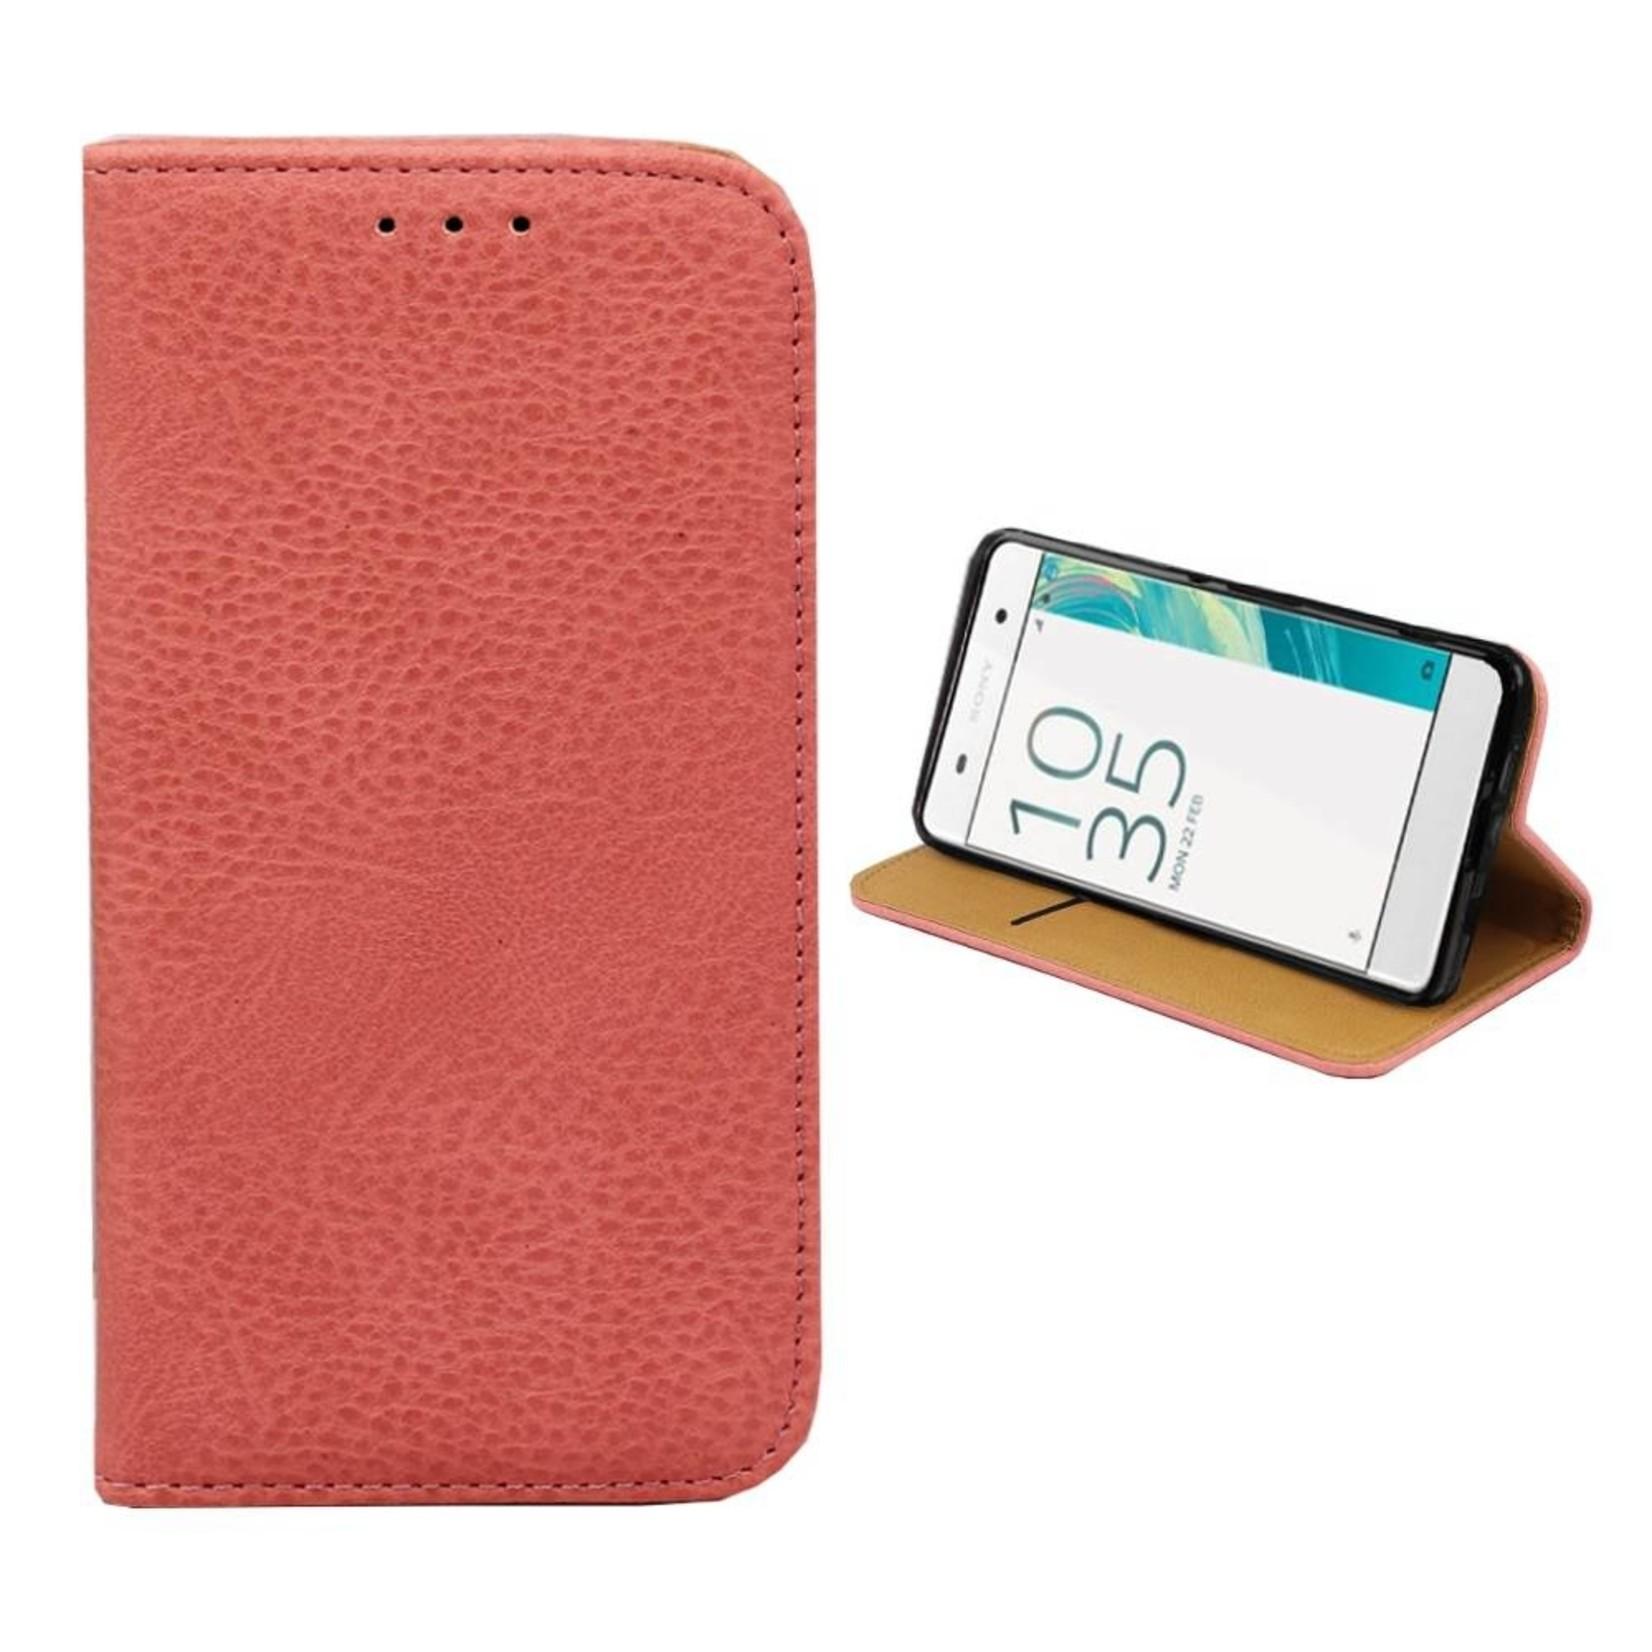 Colorfone Hoesje Book voor Sony Xperia X Roze